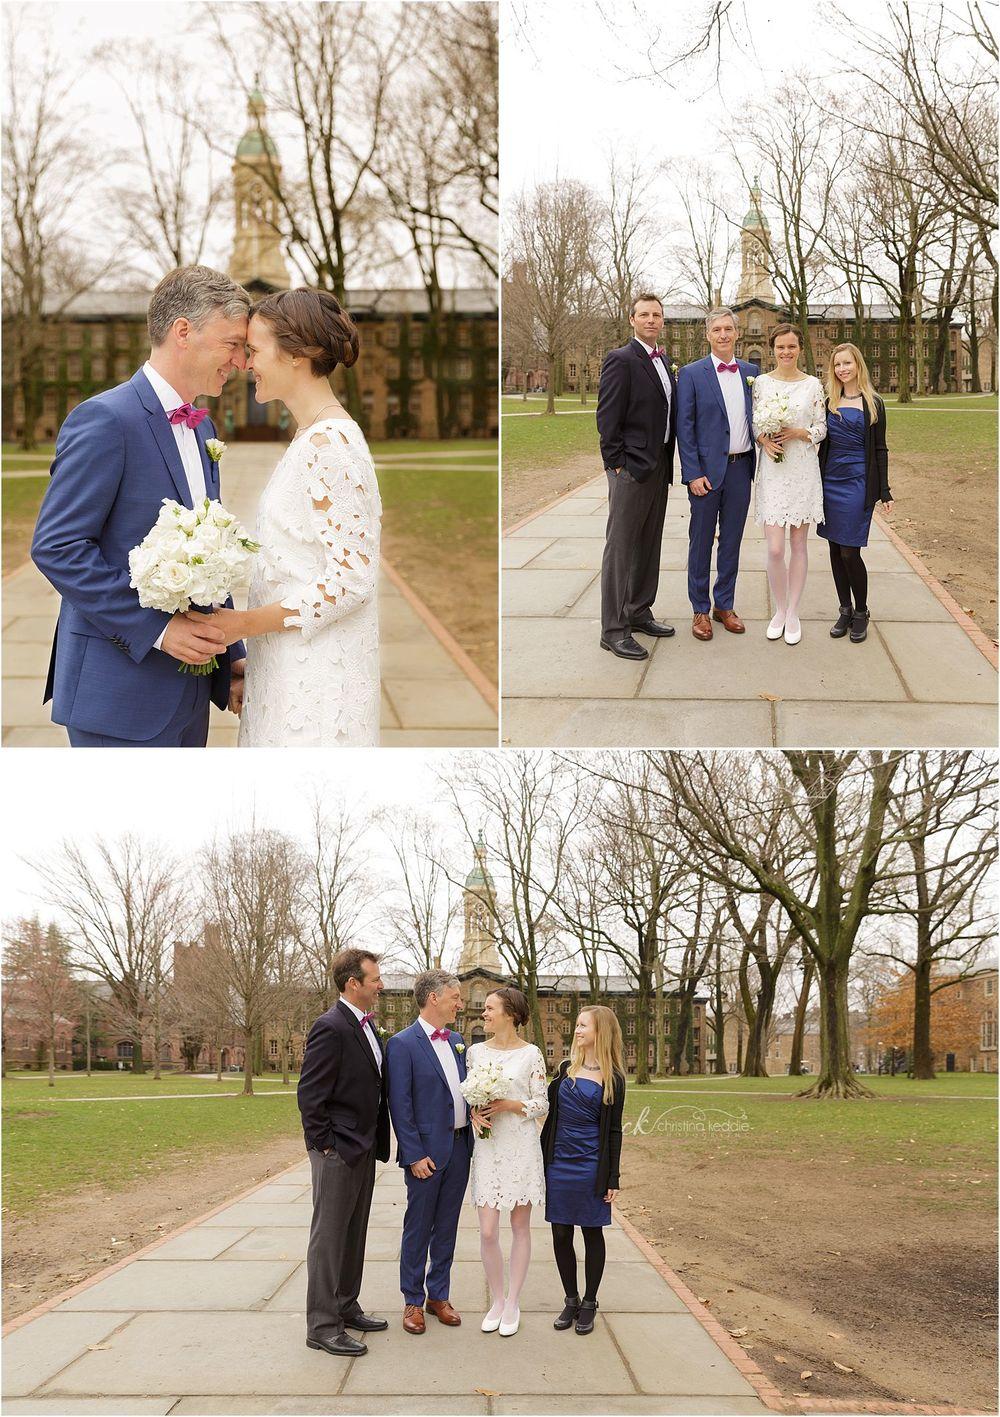 Bride and groom with bridal party by Nassau Hall | Christina Keddie Photography | Princeton NJ wedding photographer